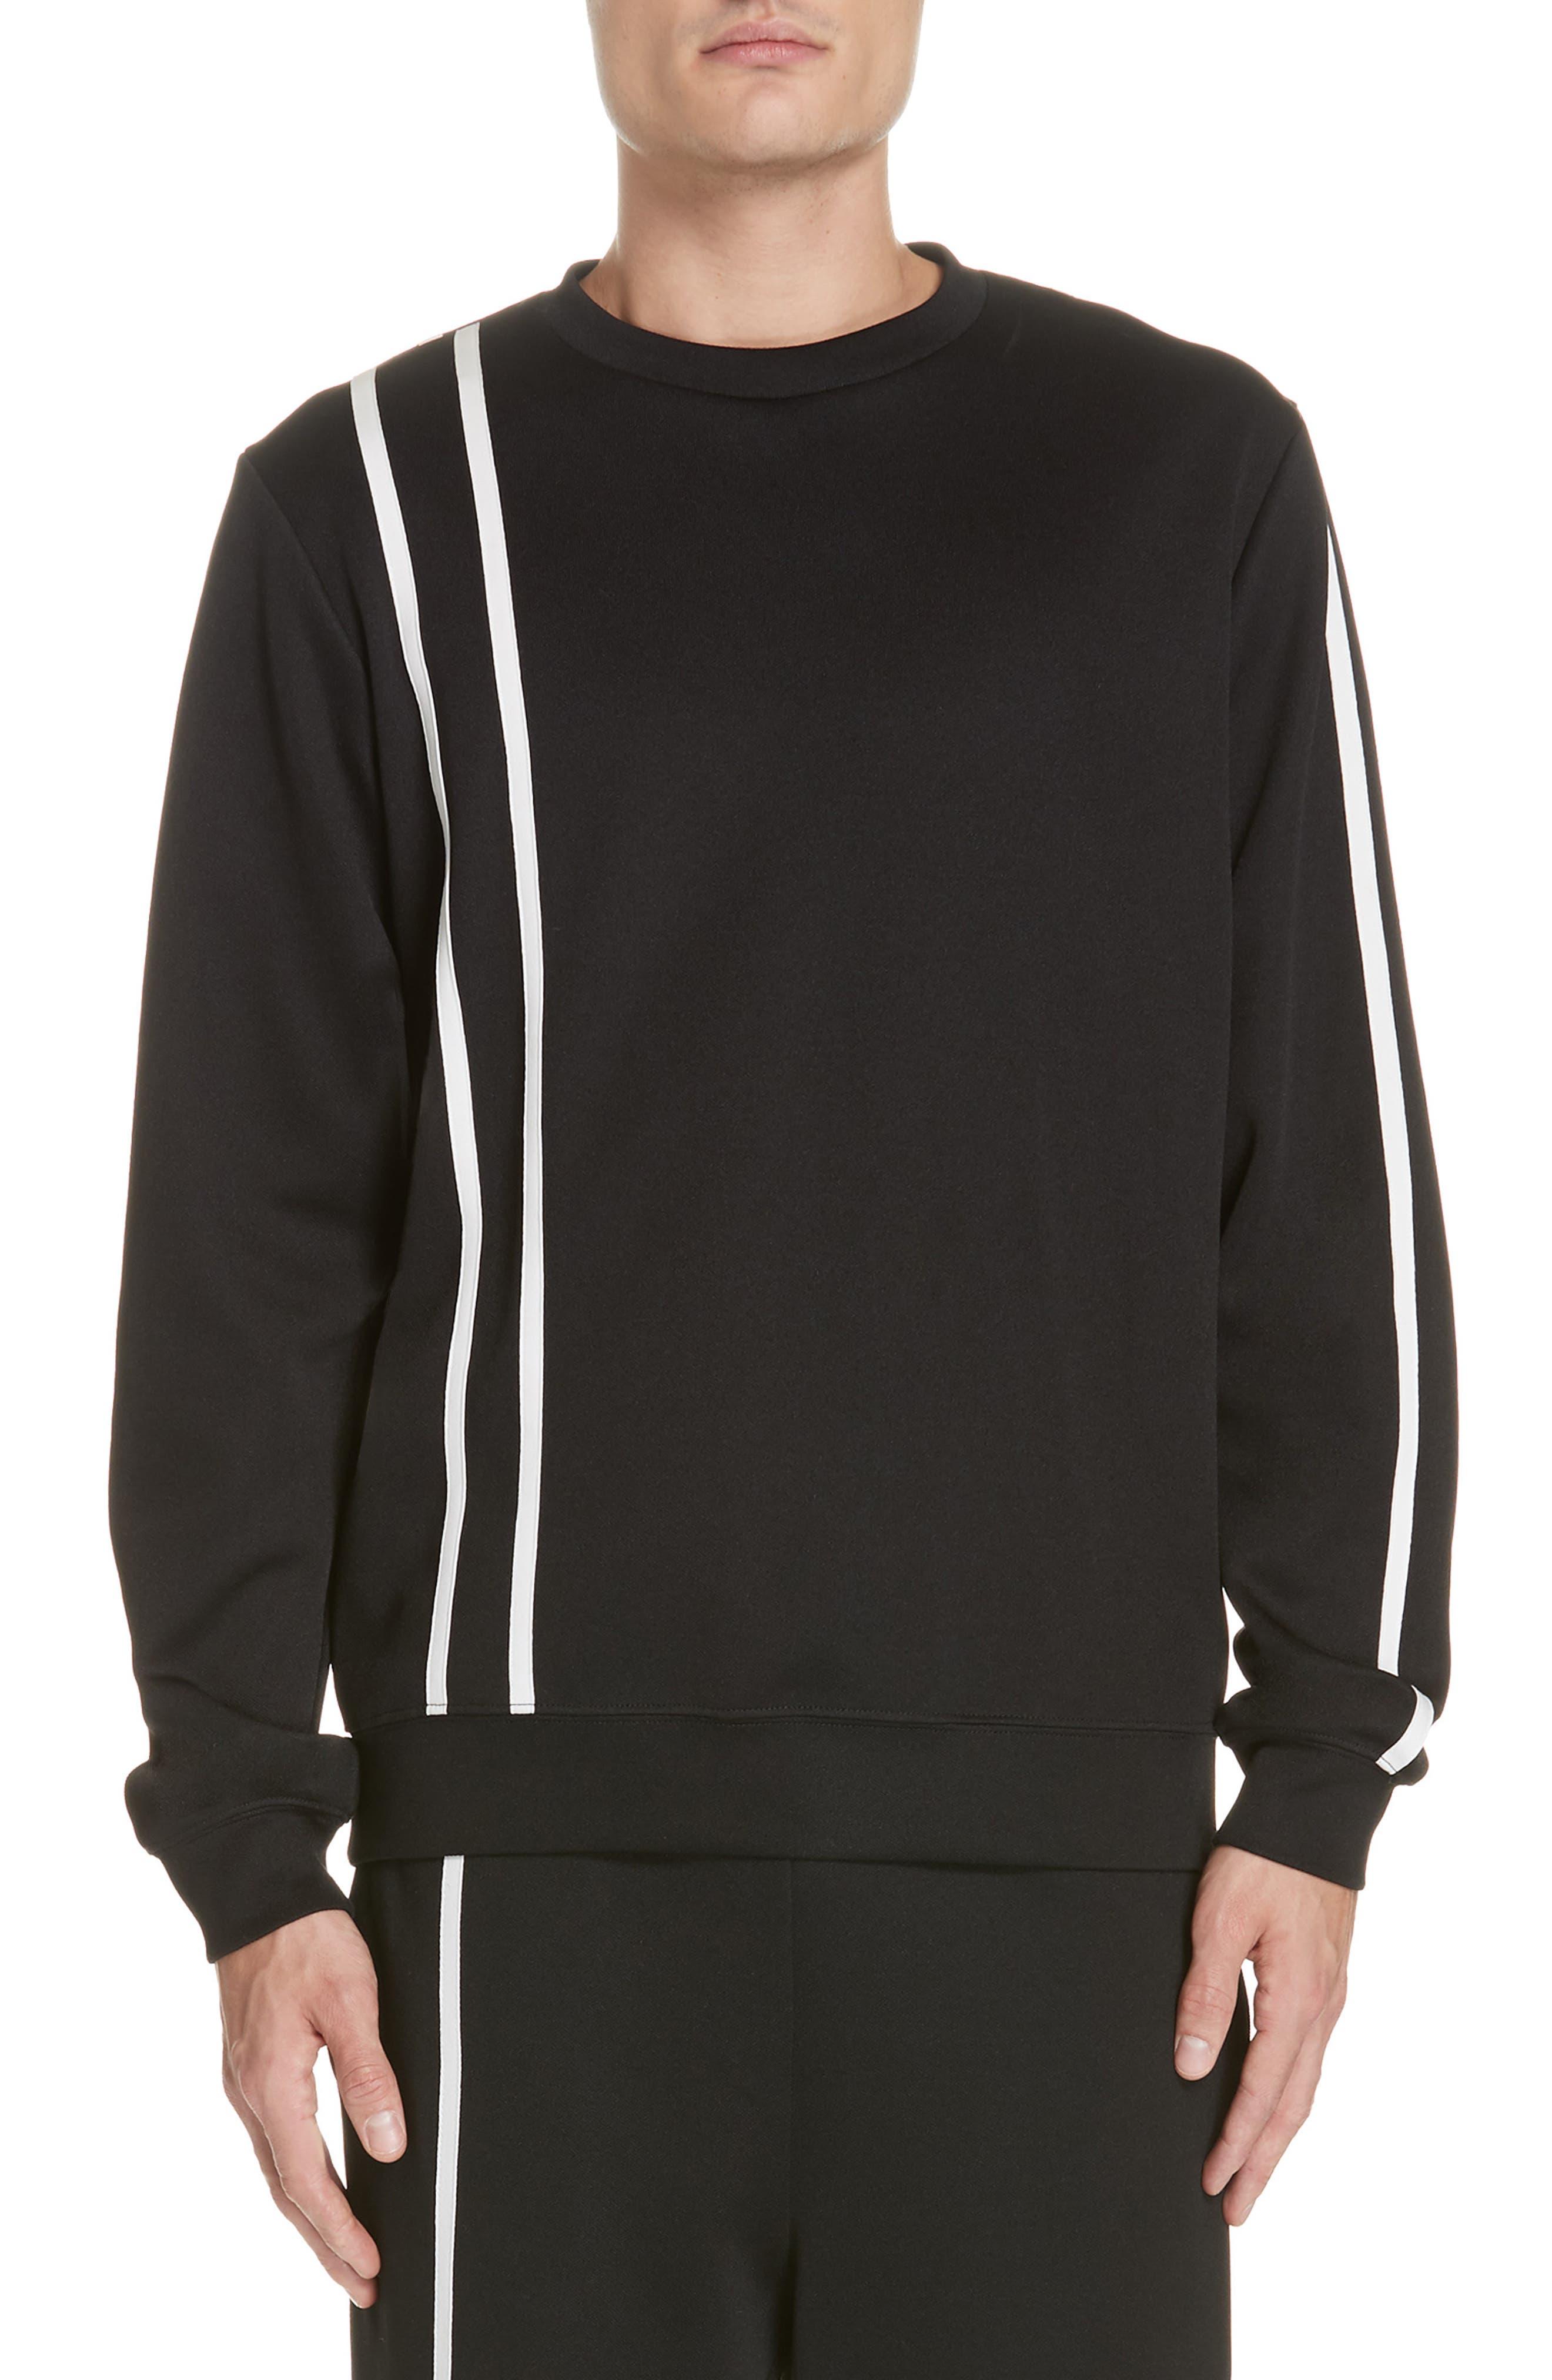 HELMUT LANG, Sport Stripe Print Sweatshirt, Main thumbnail 1, color, BLACK AND WHITE